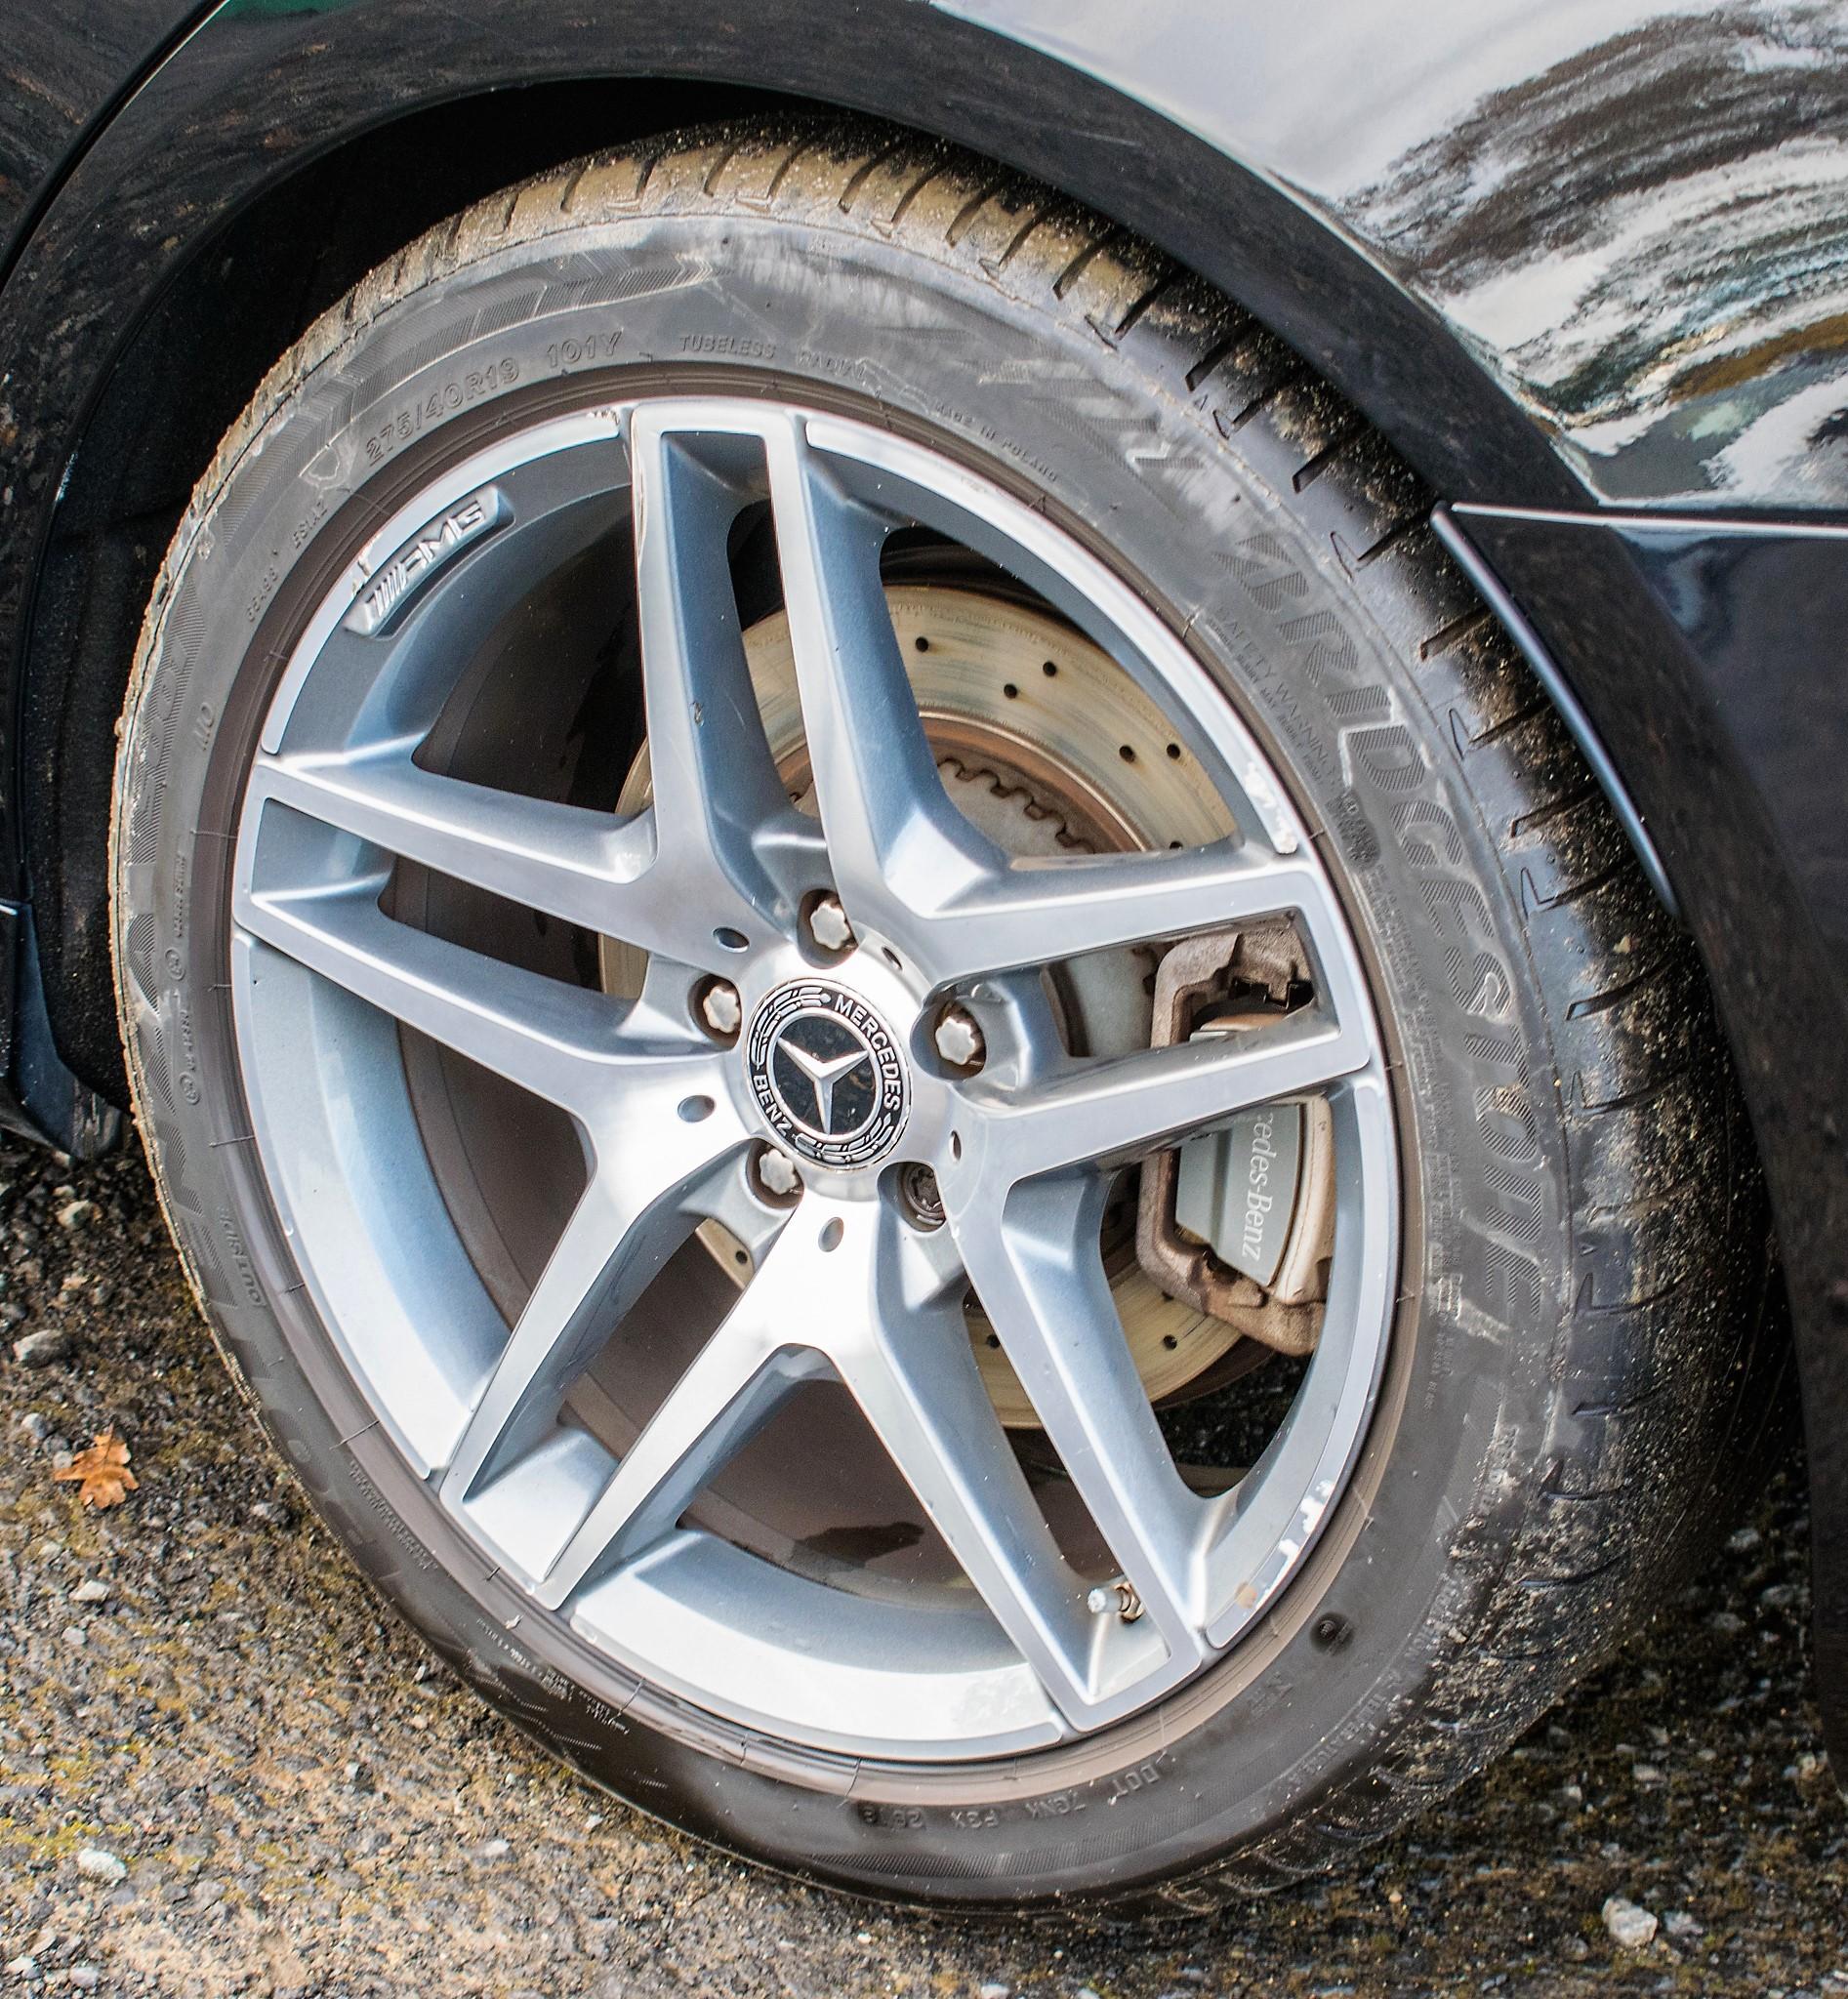 Mercedes Benz S450 L AMG Line Executive auto petrol 4 door saloon car Registration Number: FX68 - Image 9 of 33